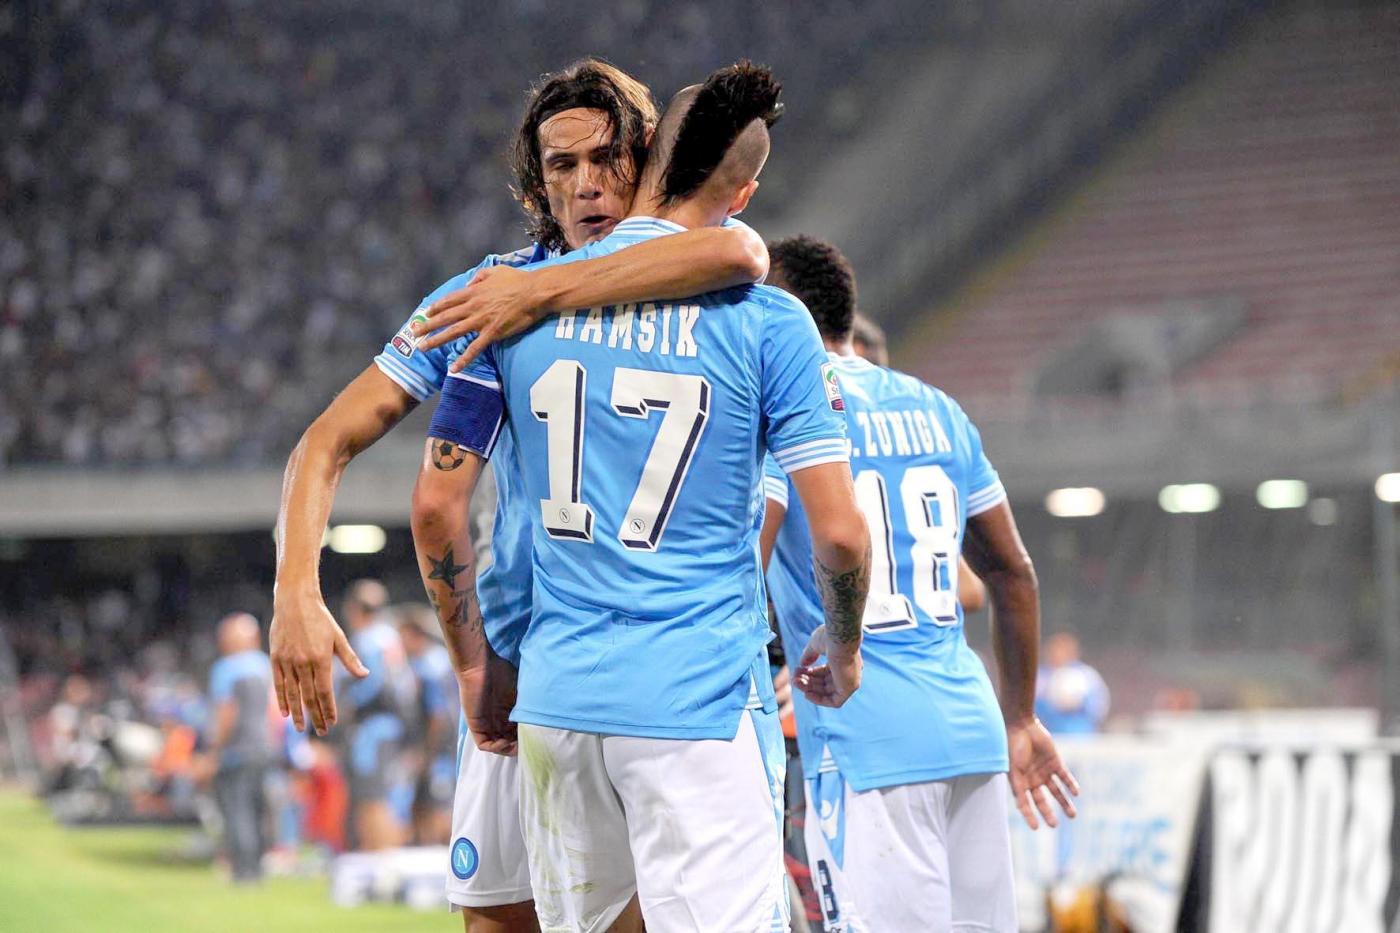 1 March, Today's Top Seria A Prediction: Napoli v Juve Prediction